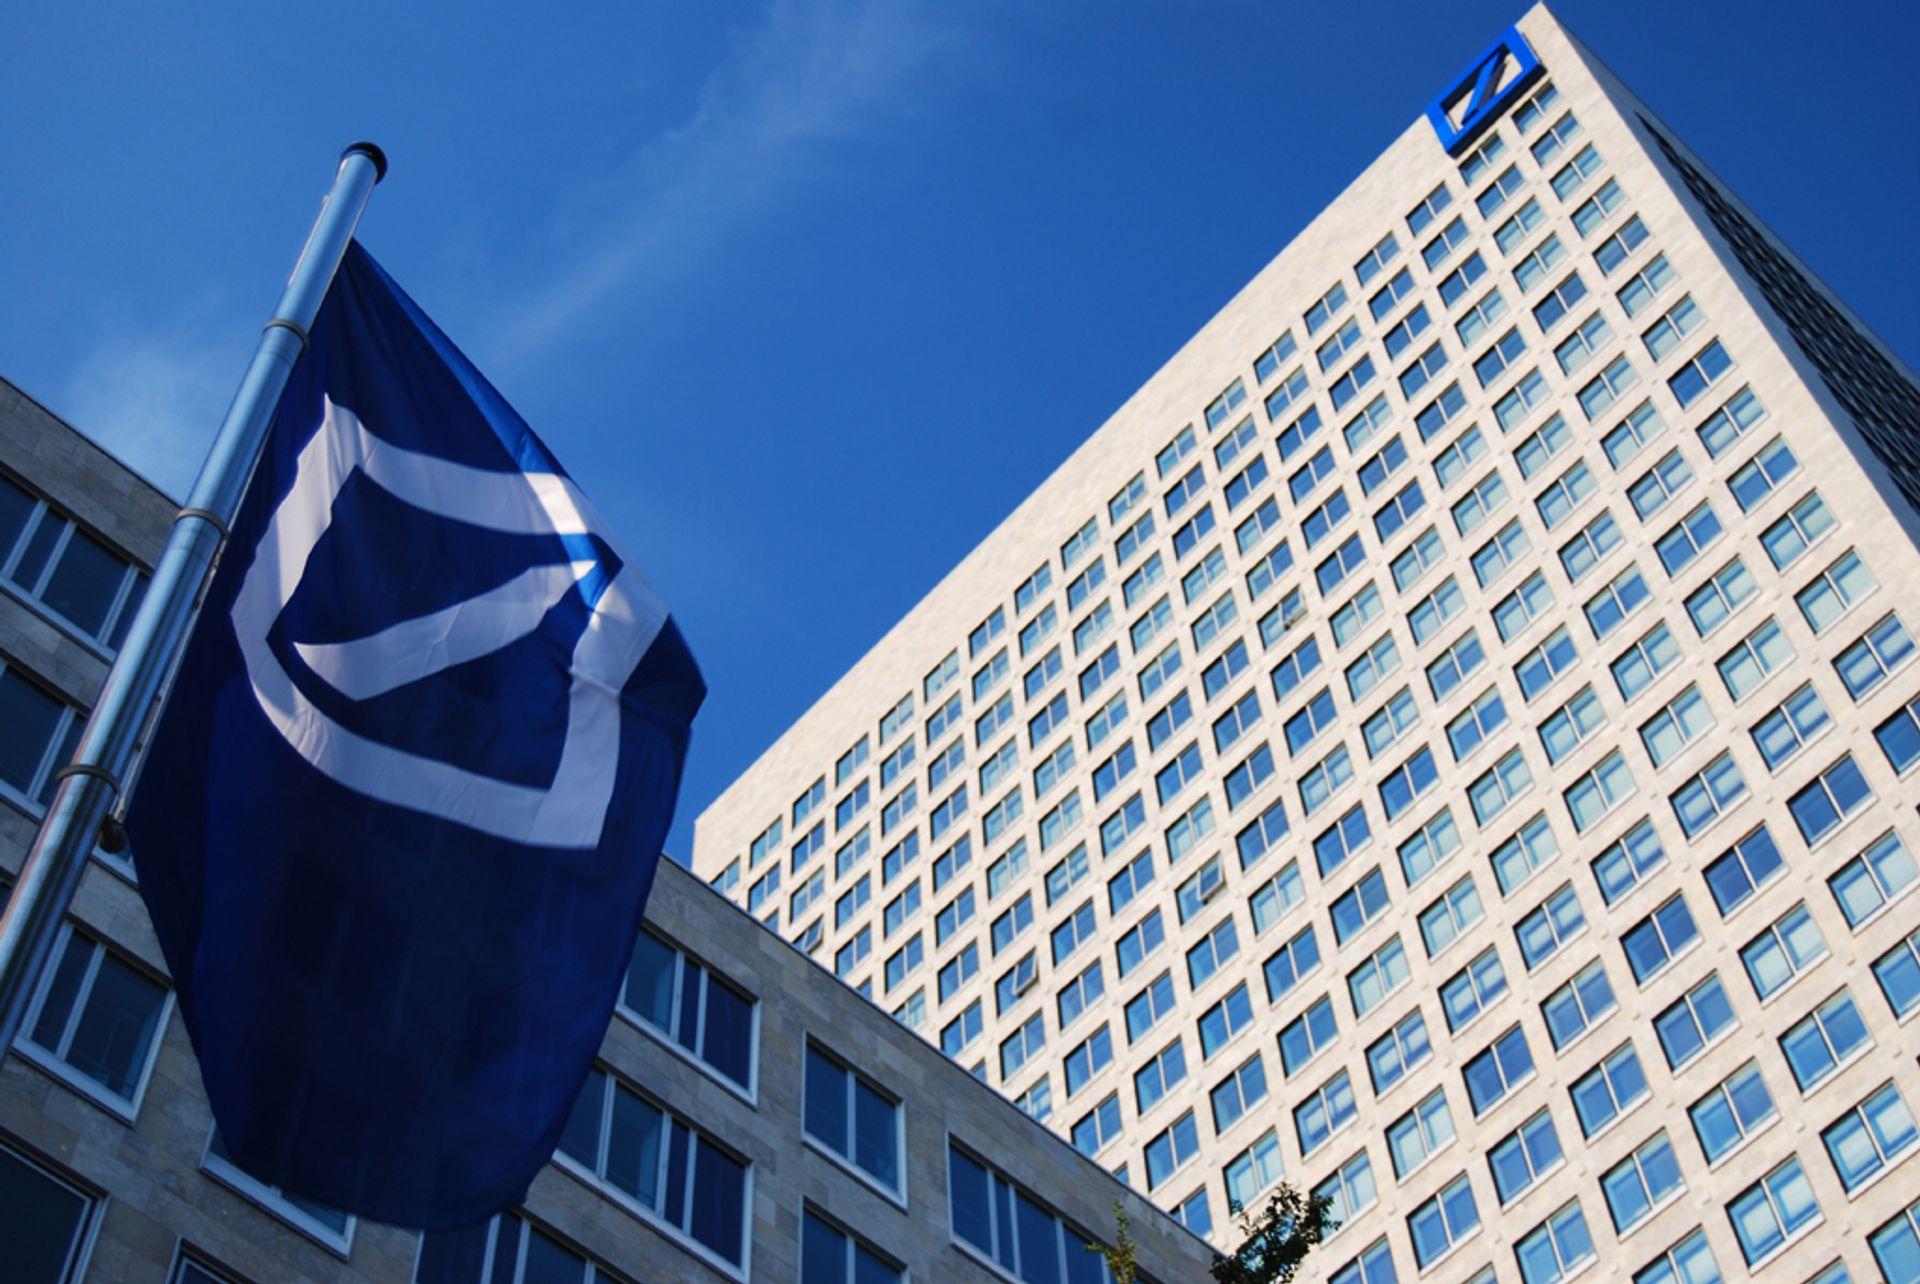 Deutsche Bank is cutting 18,000 jobs